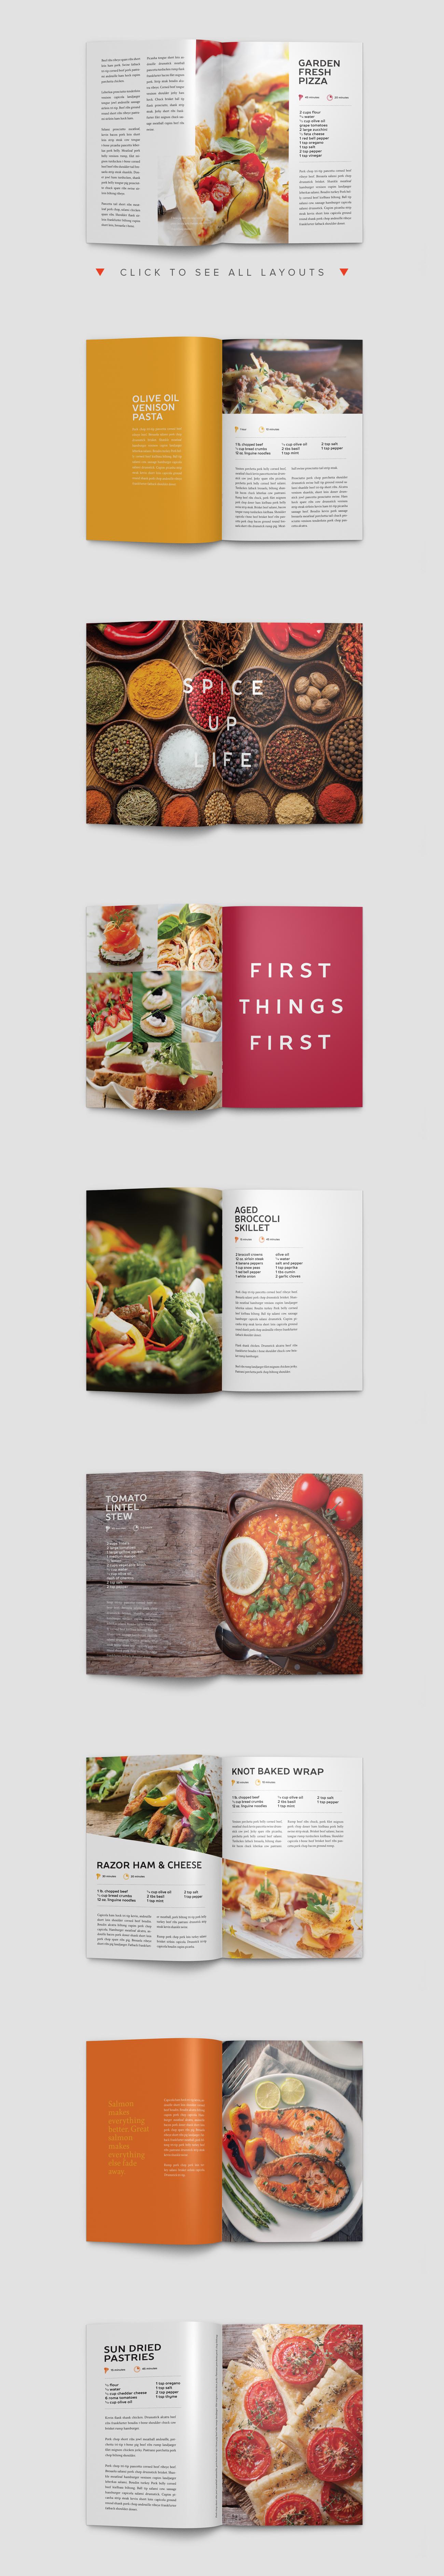 Modern Cookbook InDesign Template   Pinterest   Diseño editorial ...